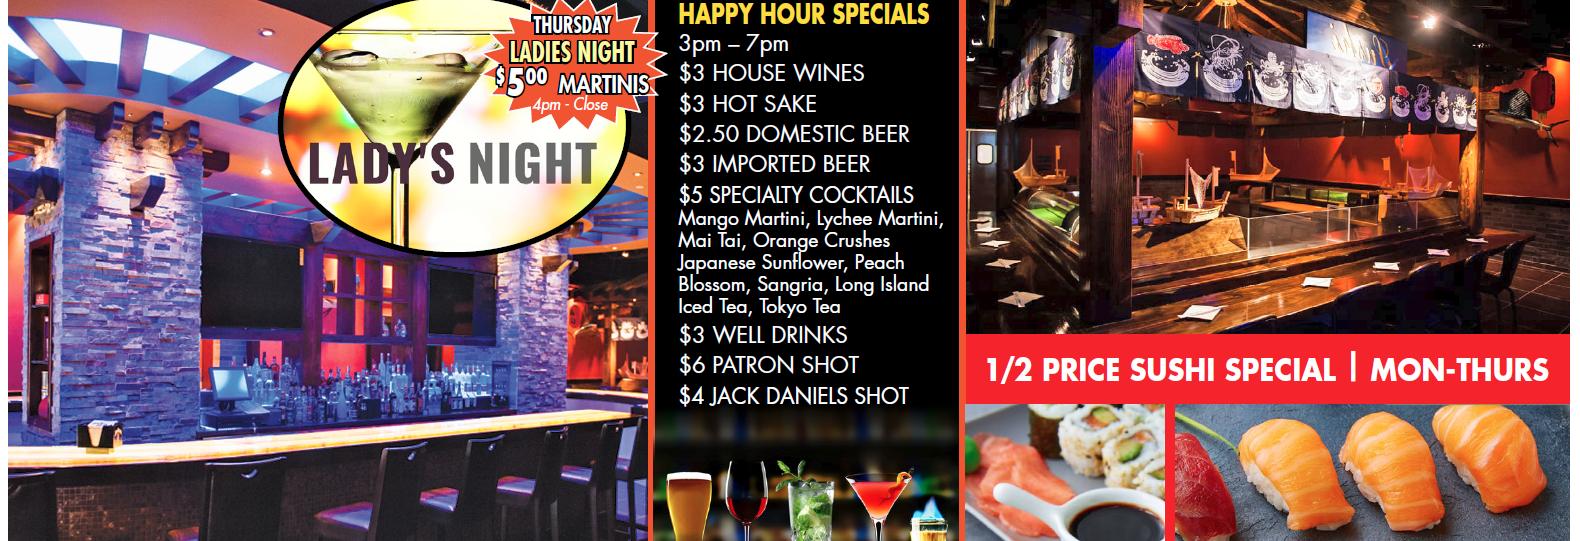 Sake Japanese Buffet, steak house, seafood, bar, hibachi, coupons, discounts, savings